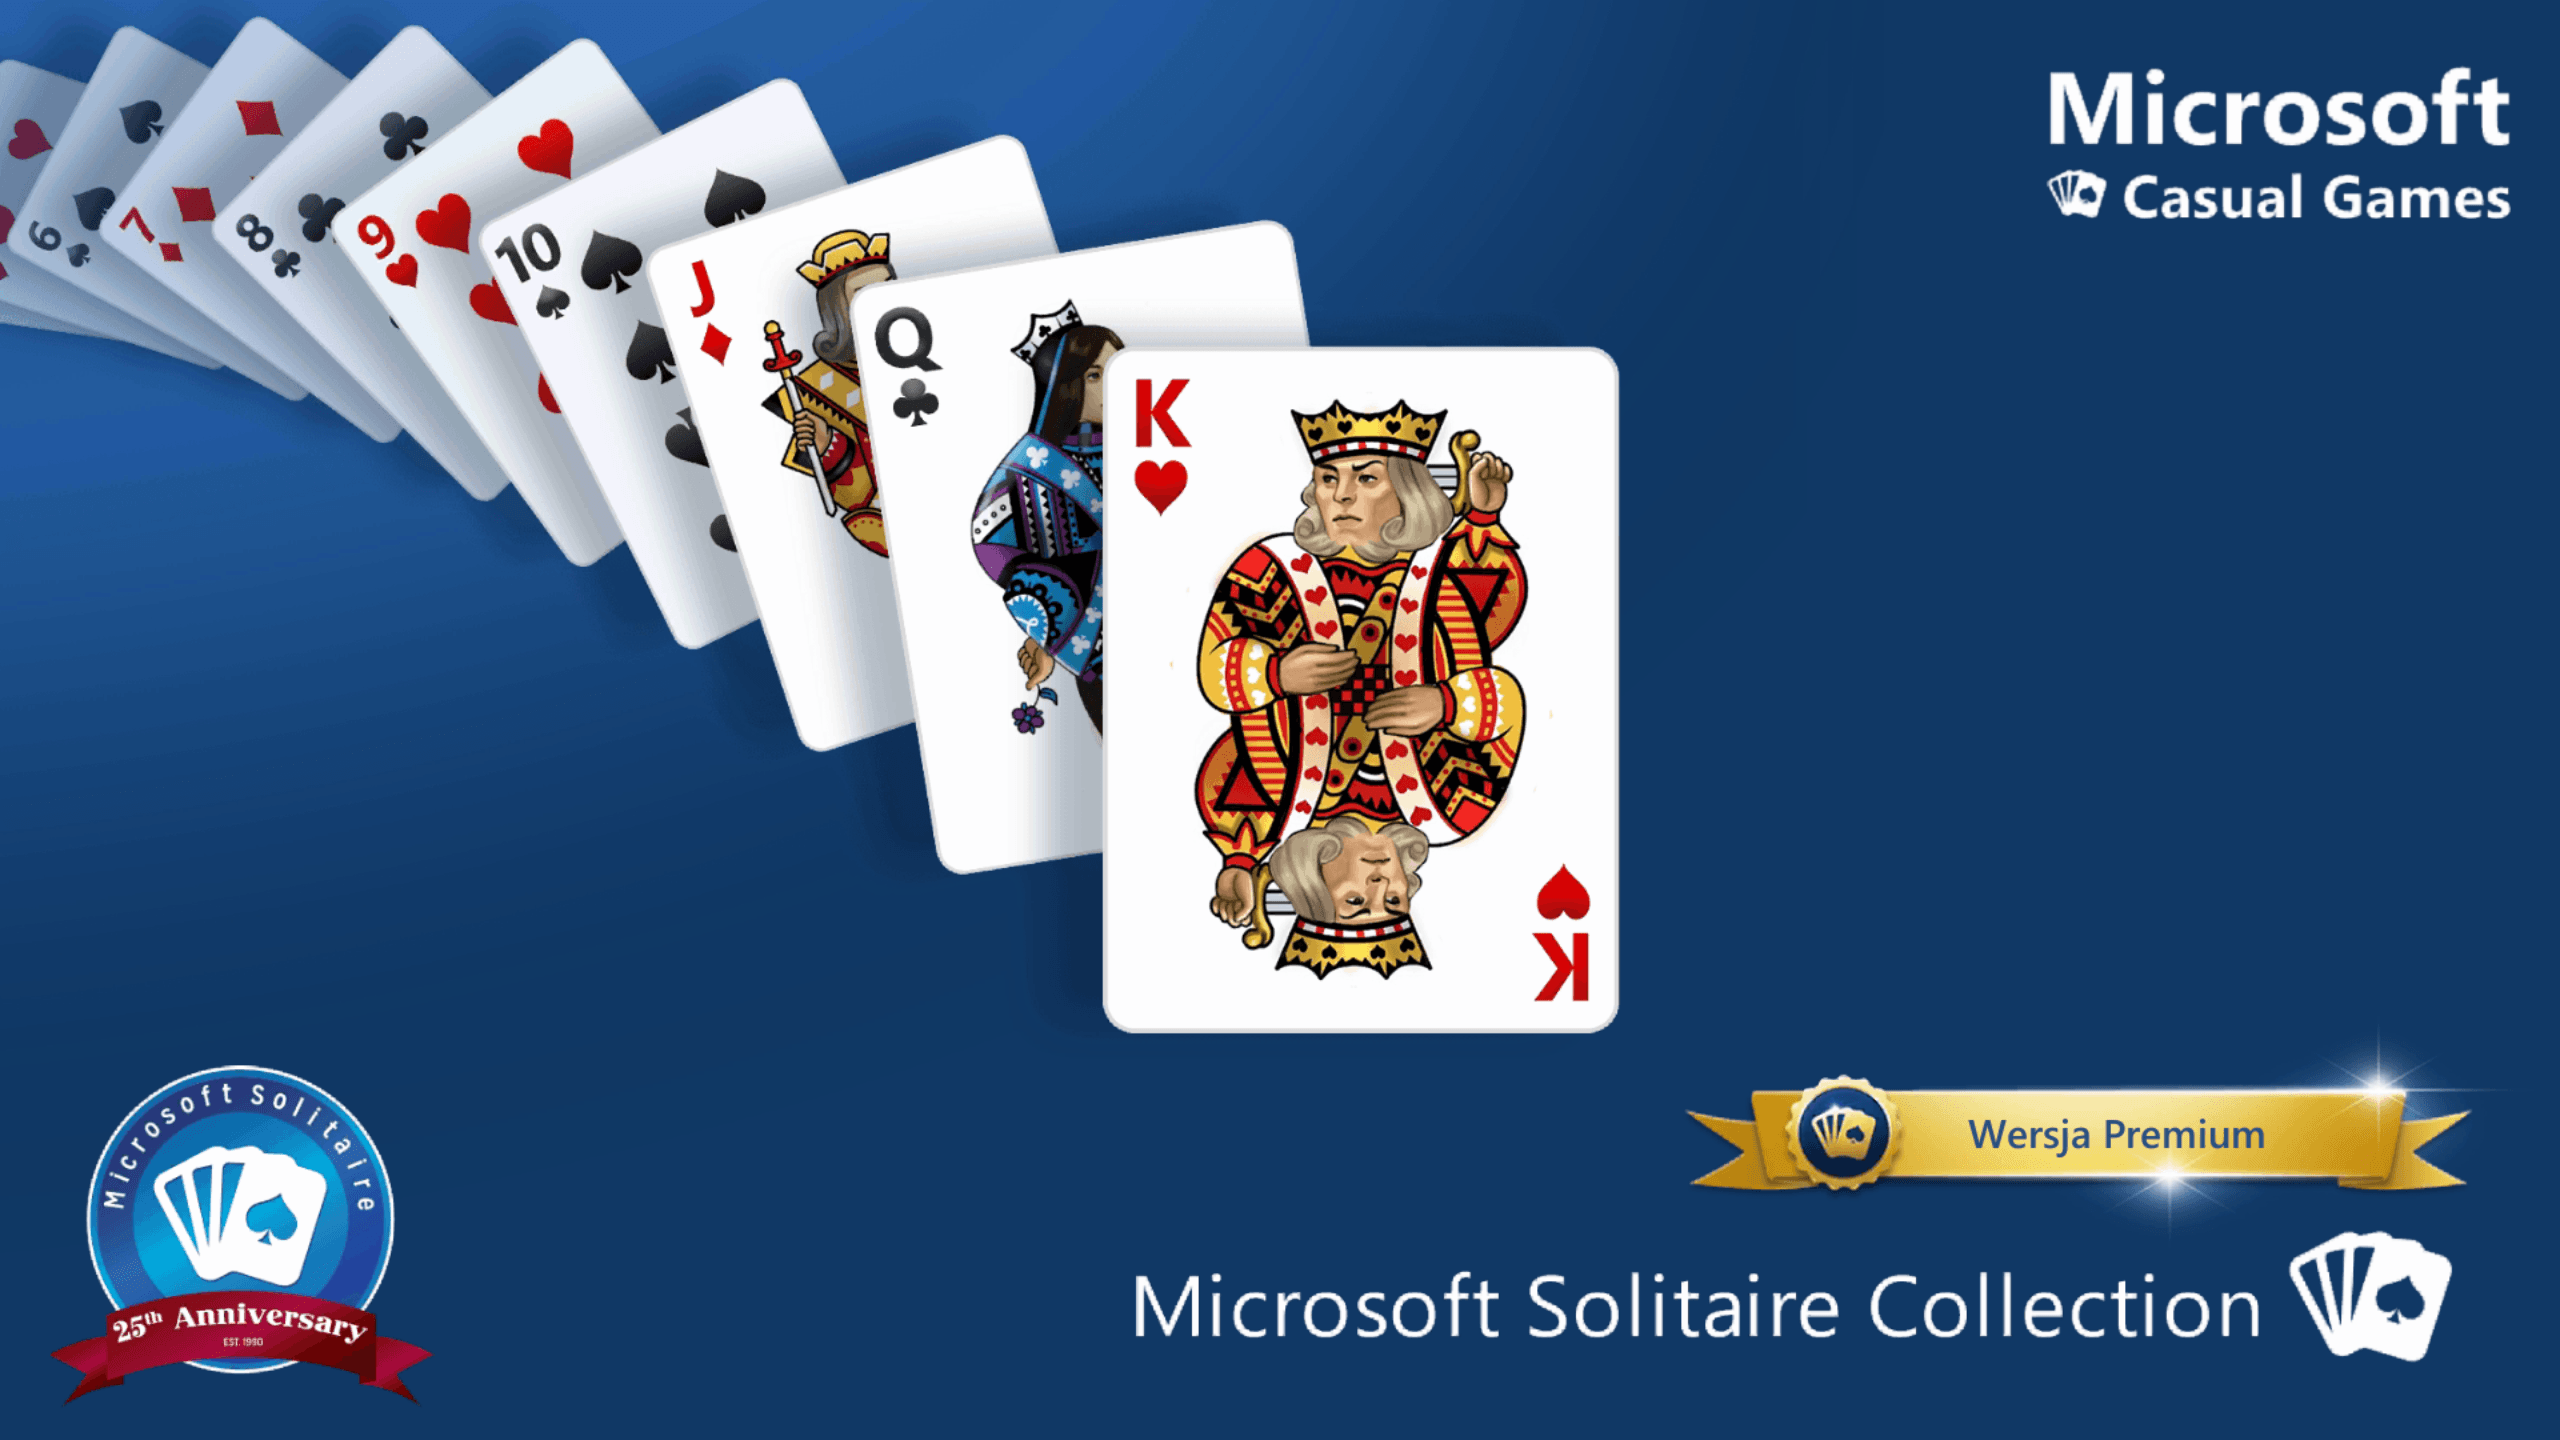 Windowsowy Pasjans - Microsoft Solitaire Collection - trafia na Androida oraz iOS 17